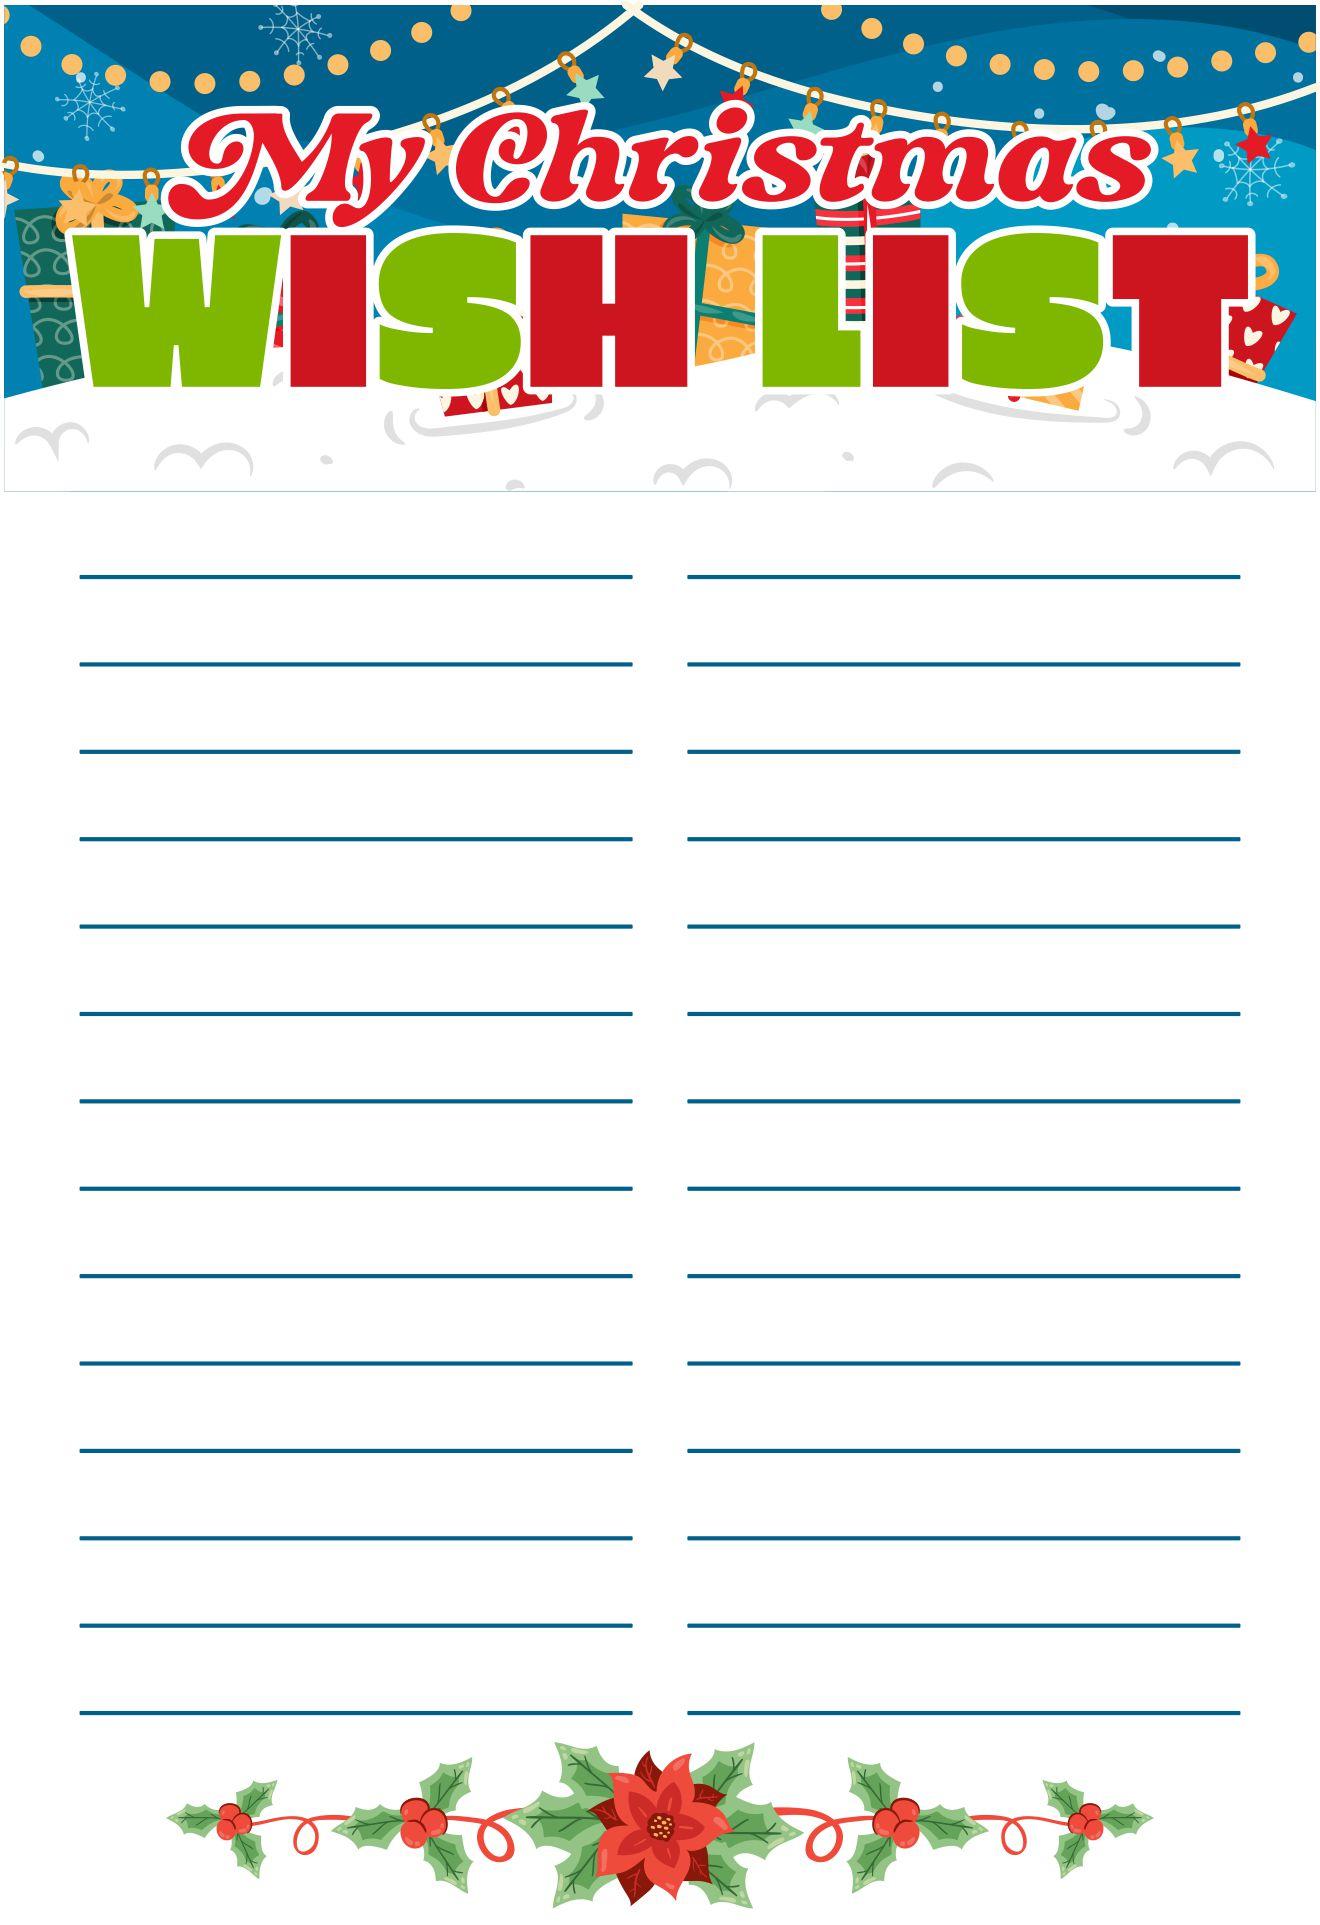 6 Images of Christmas Wish List Free Printable Templates